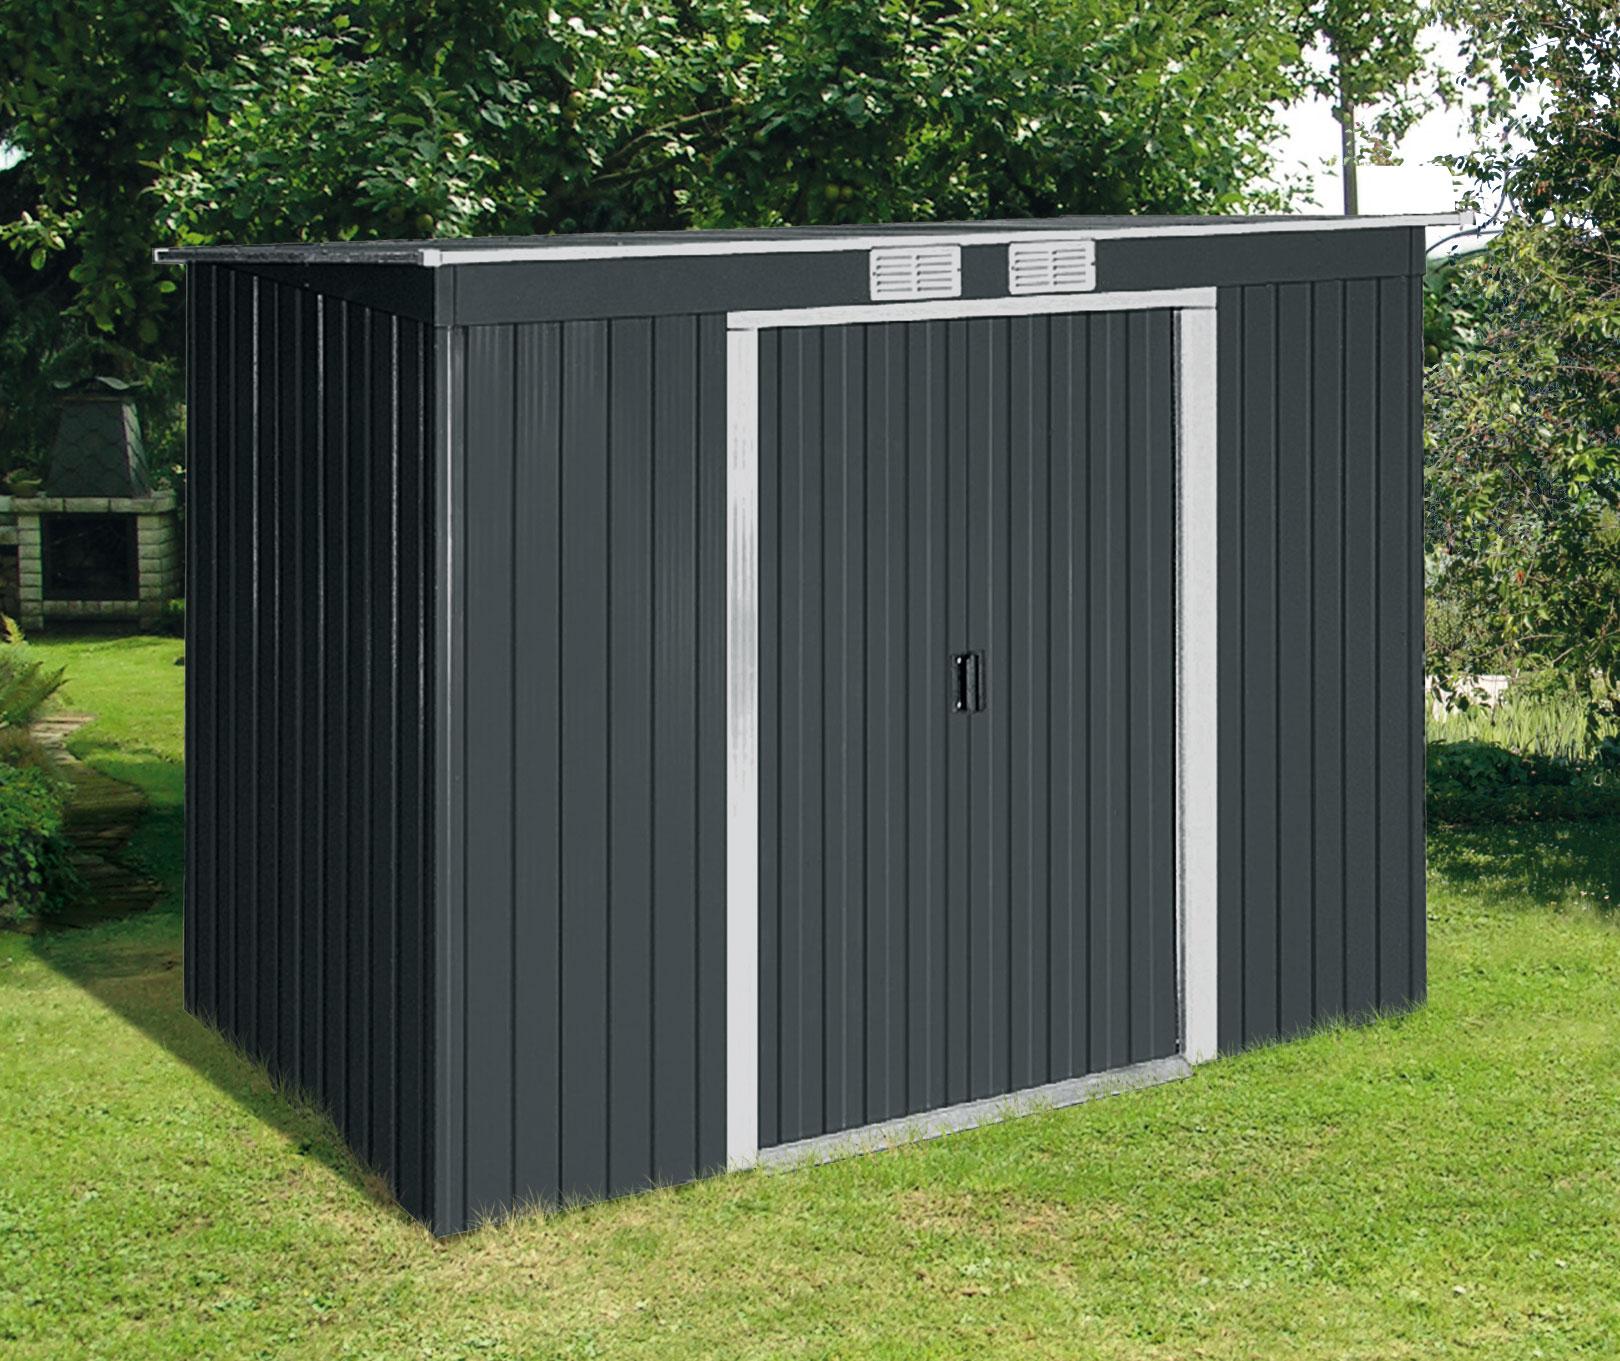 Duramax Gerätehaus Metall Pultdach Pent Roof 8x4 anthrazit